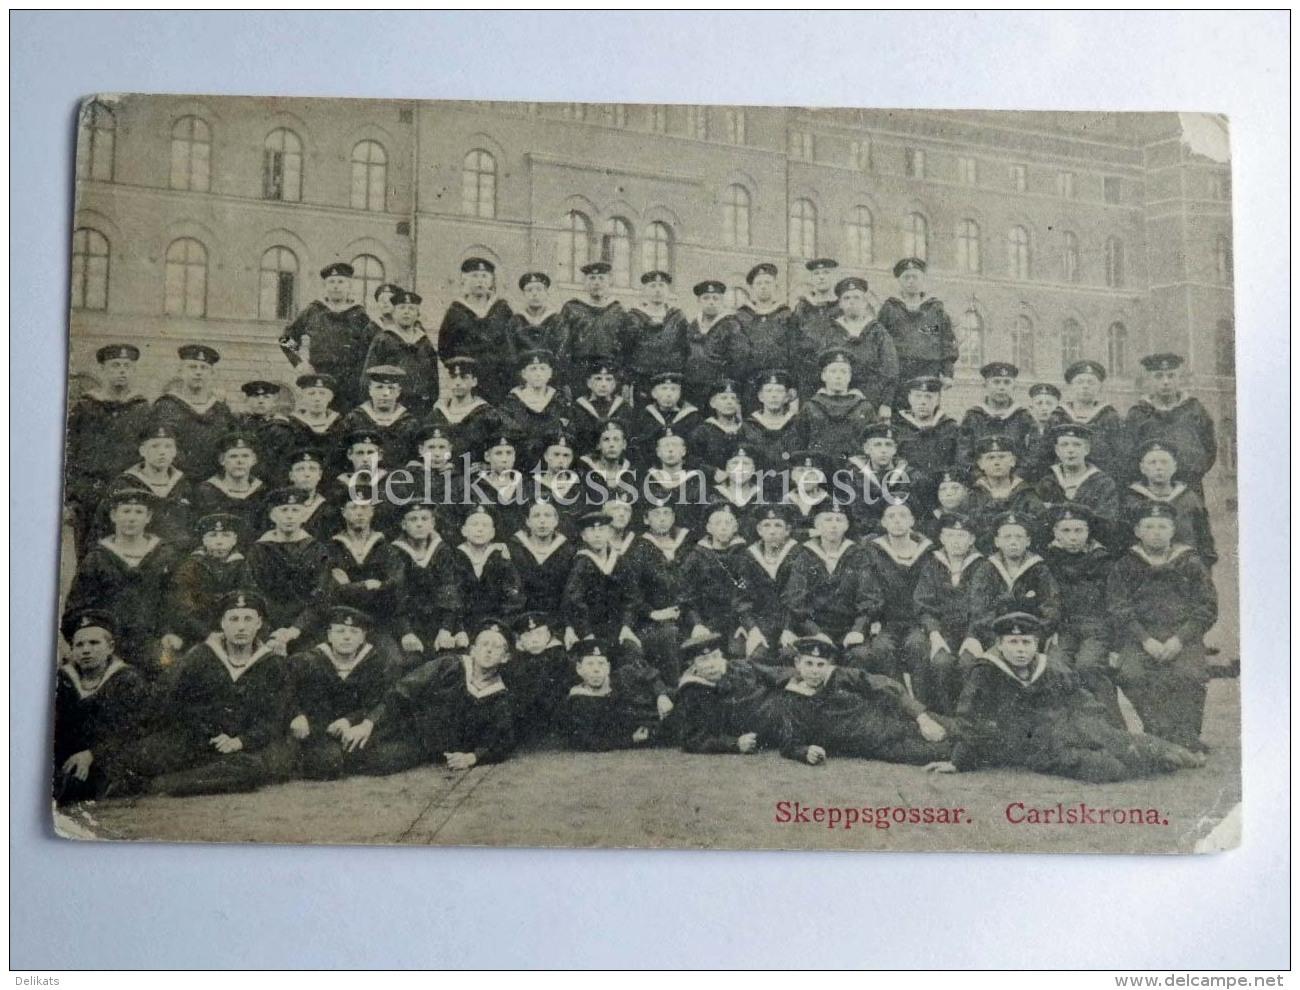 SVEZIA NAVE SHIP HSwMS CARLSKRONA Svenska Marinen Skeppsgossar Old Postcard - Guerra